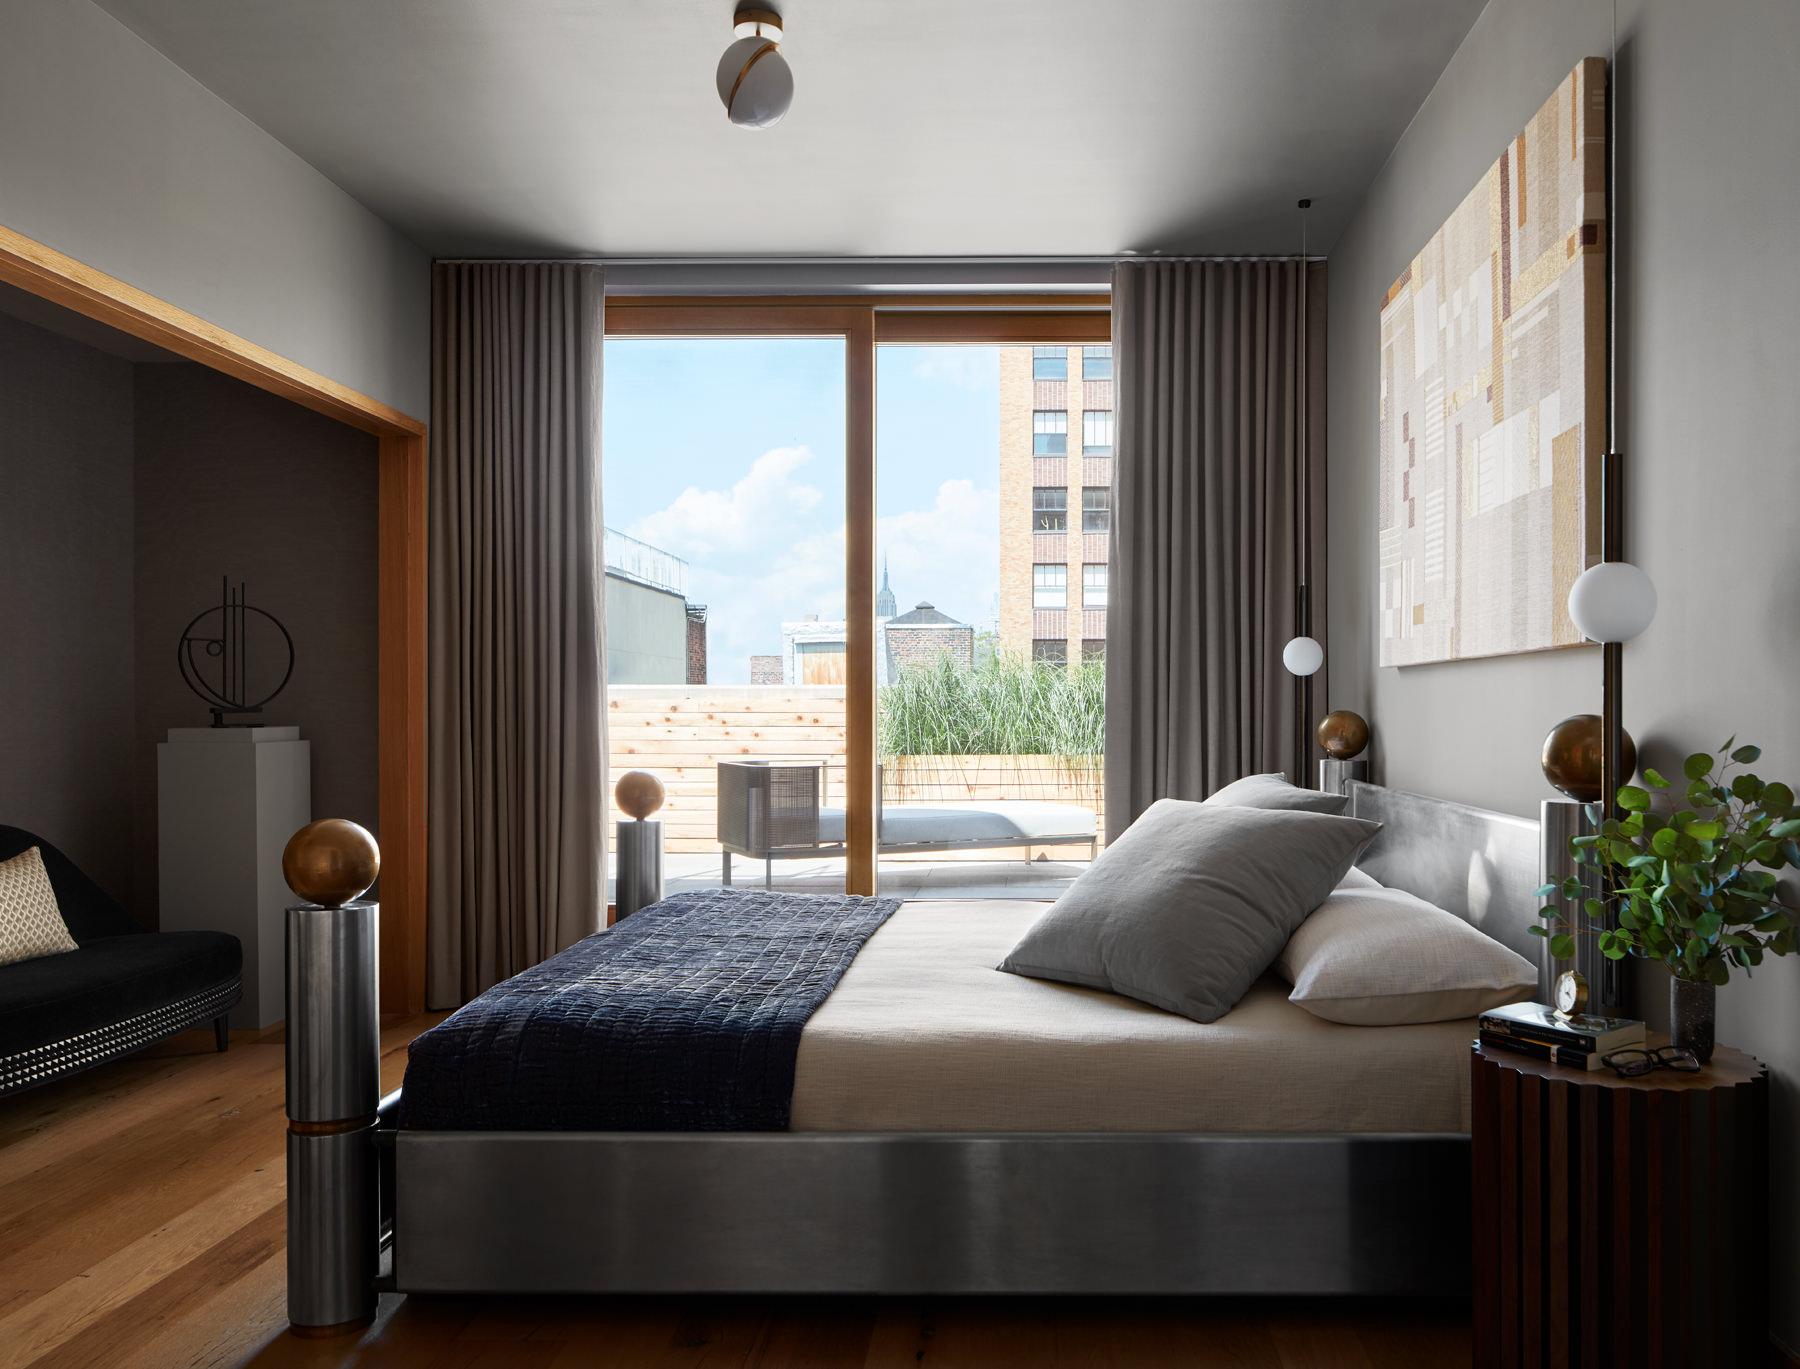 Lee Broom Penthouse New York Master Bedroom Photo Stephen Kent Johnson Yellowtrace 17